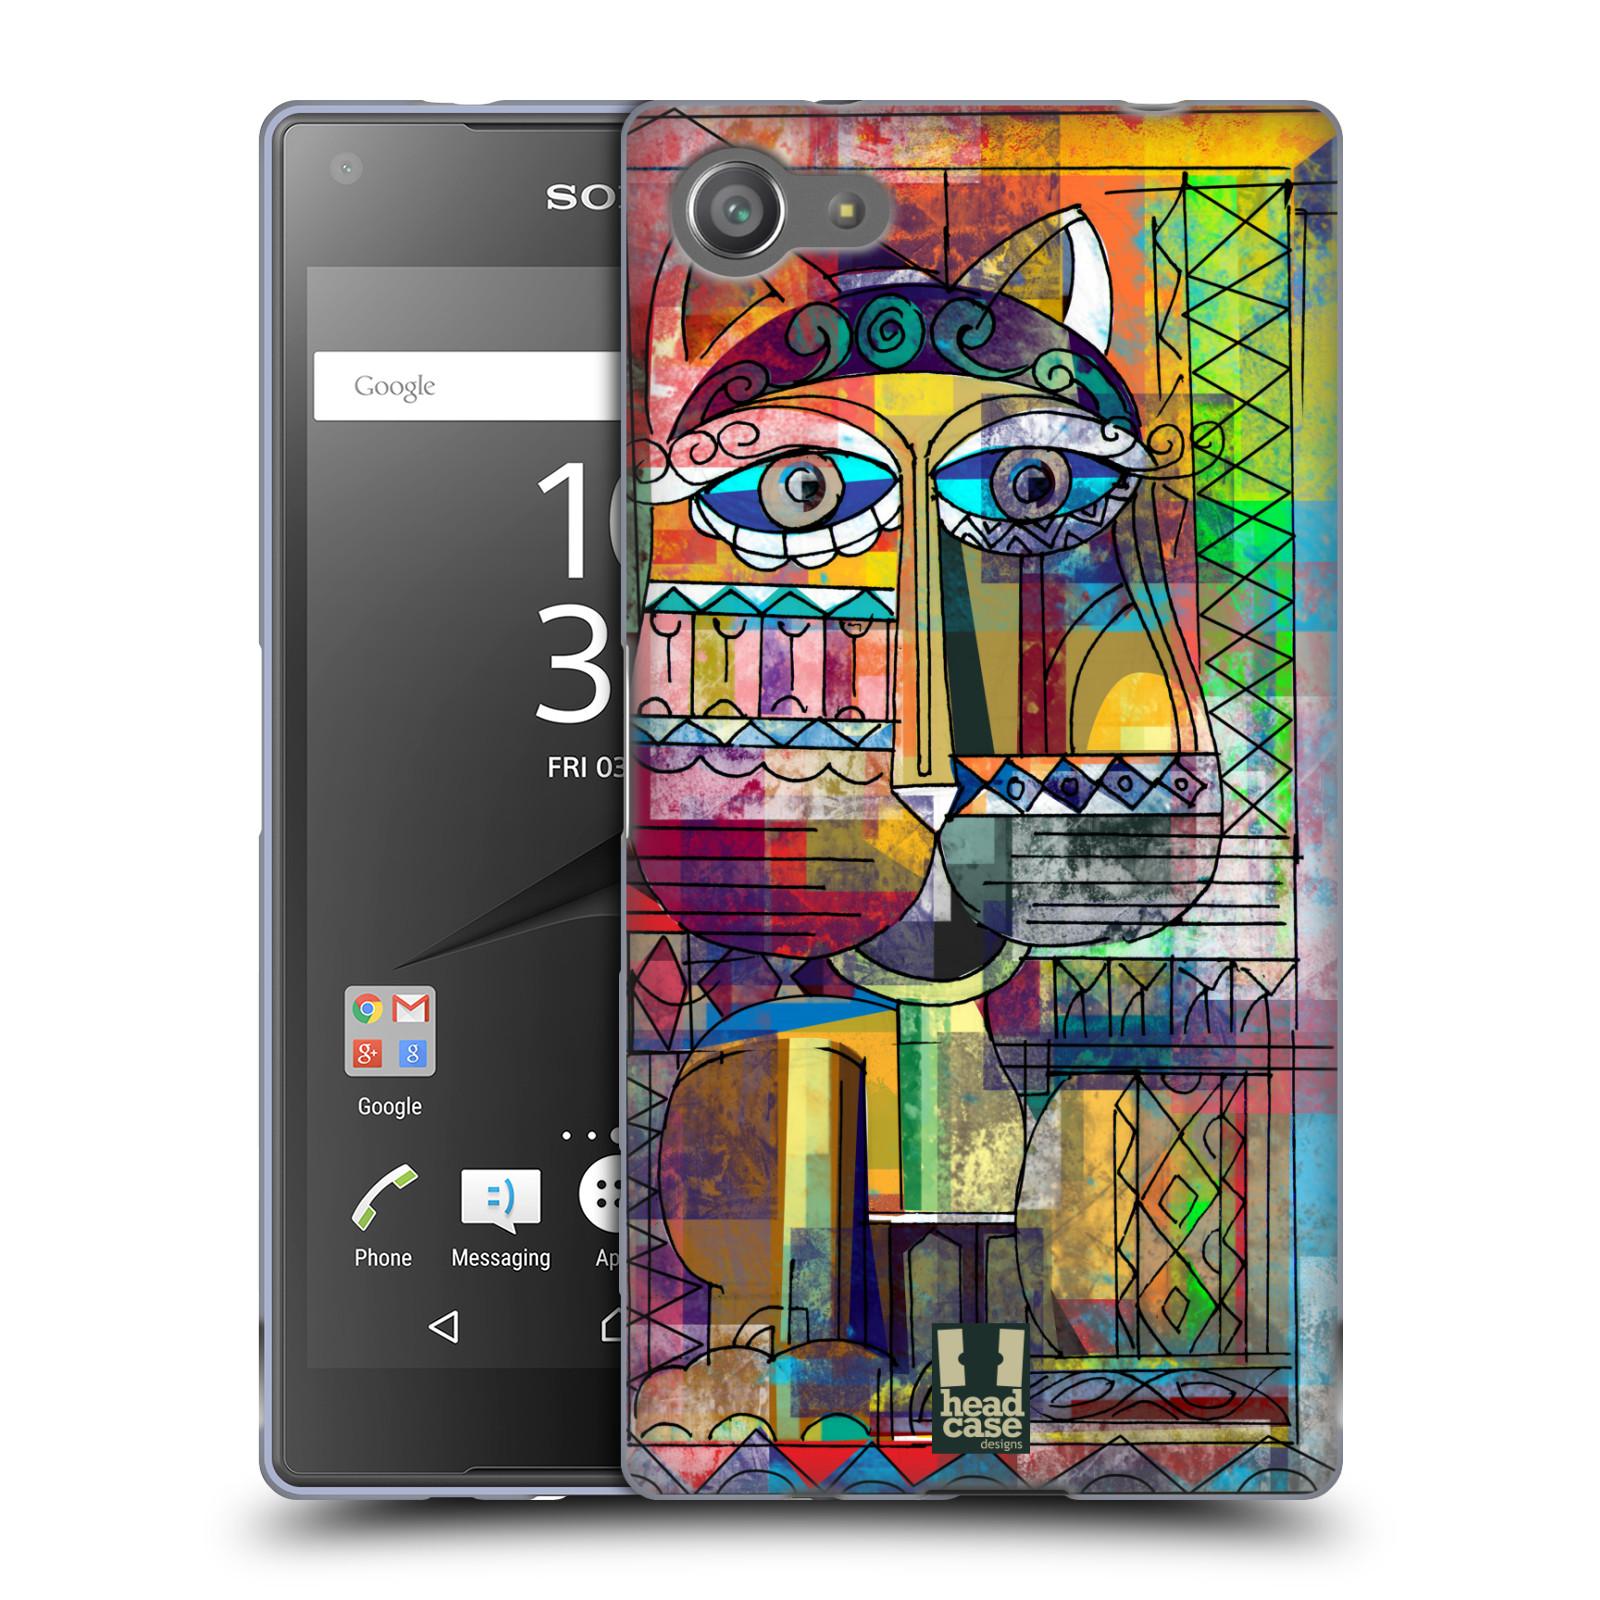 Silikonové pouzdro na mobil Sony Xperia Z5 Compact HEAD CASE AZTEC KORAT